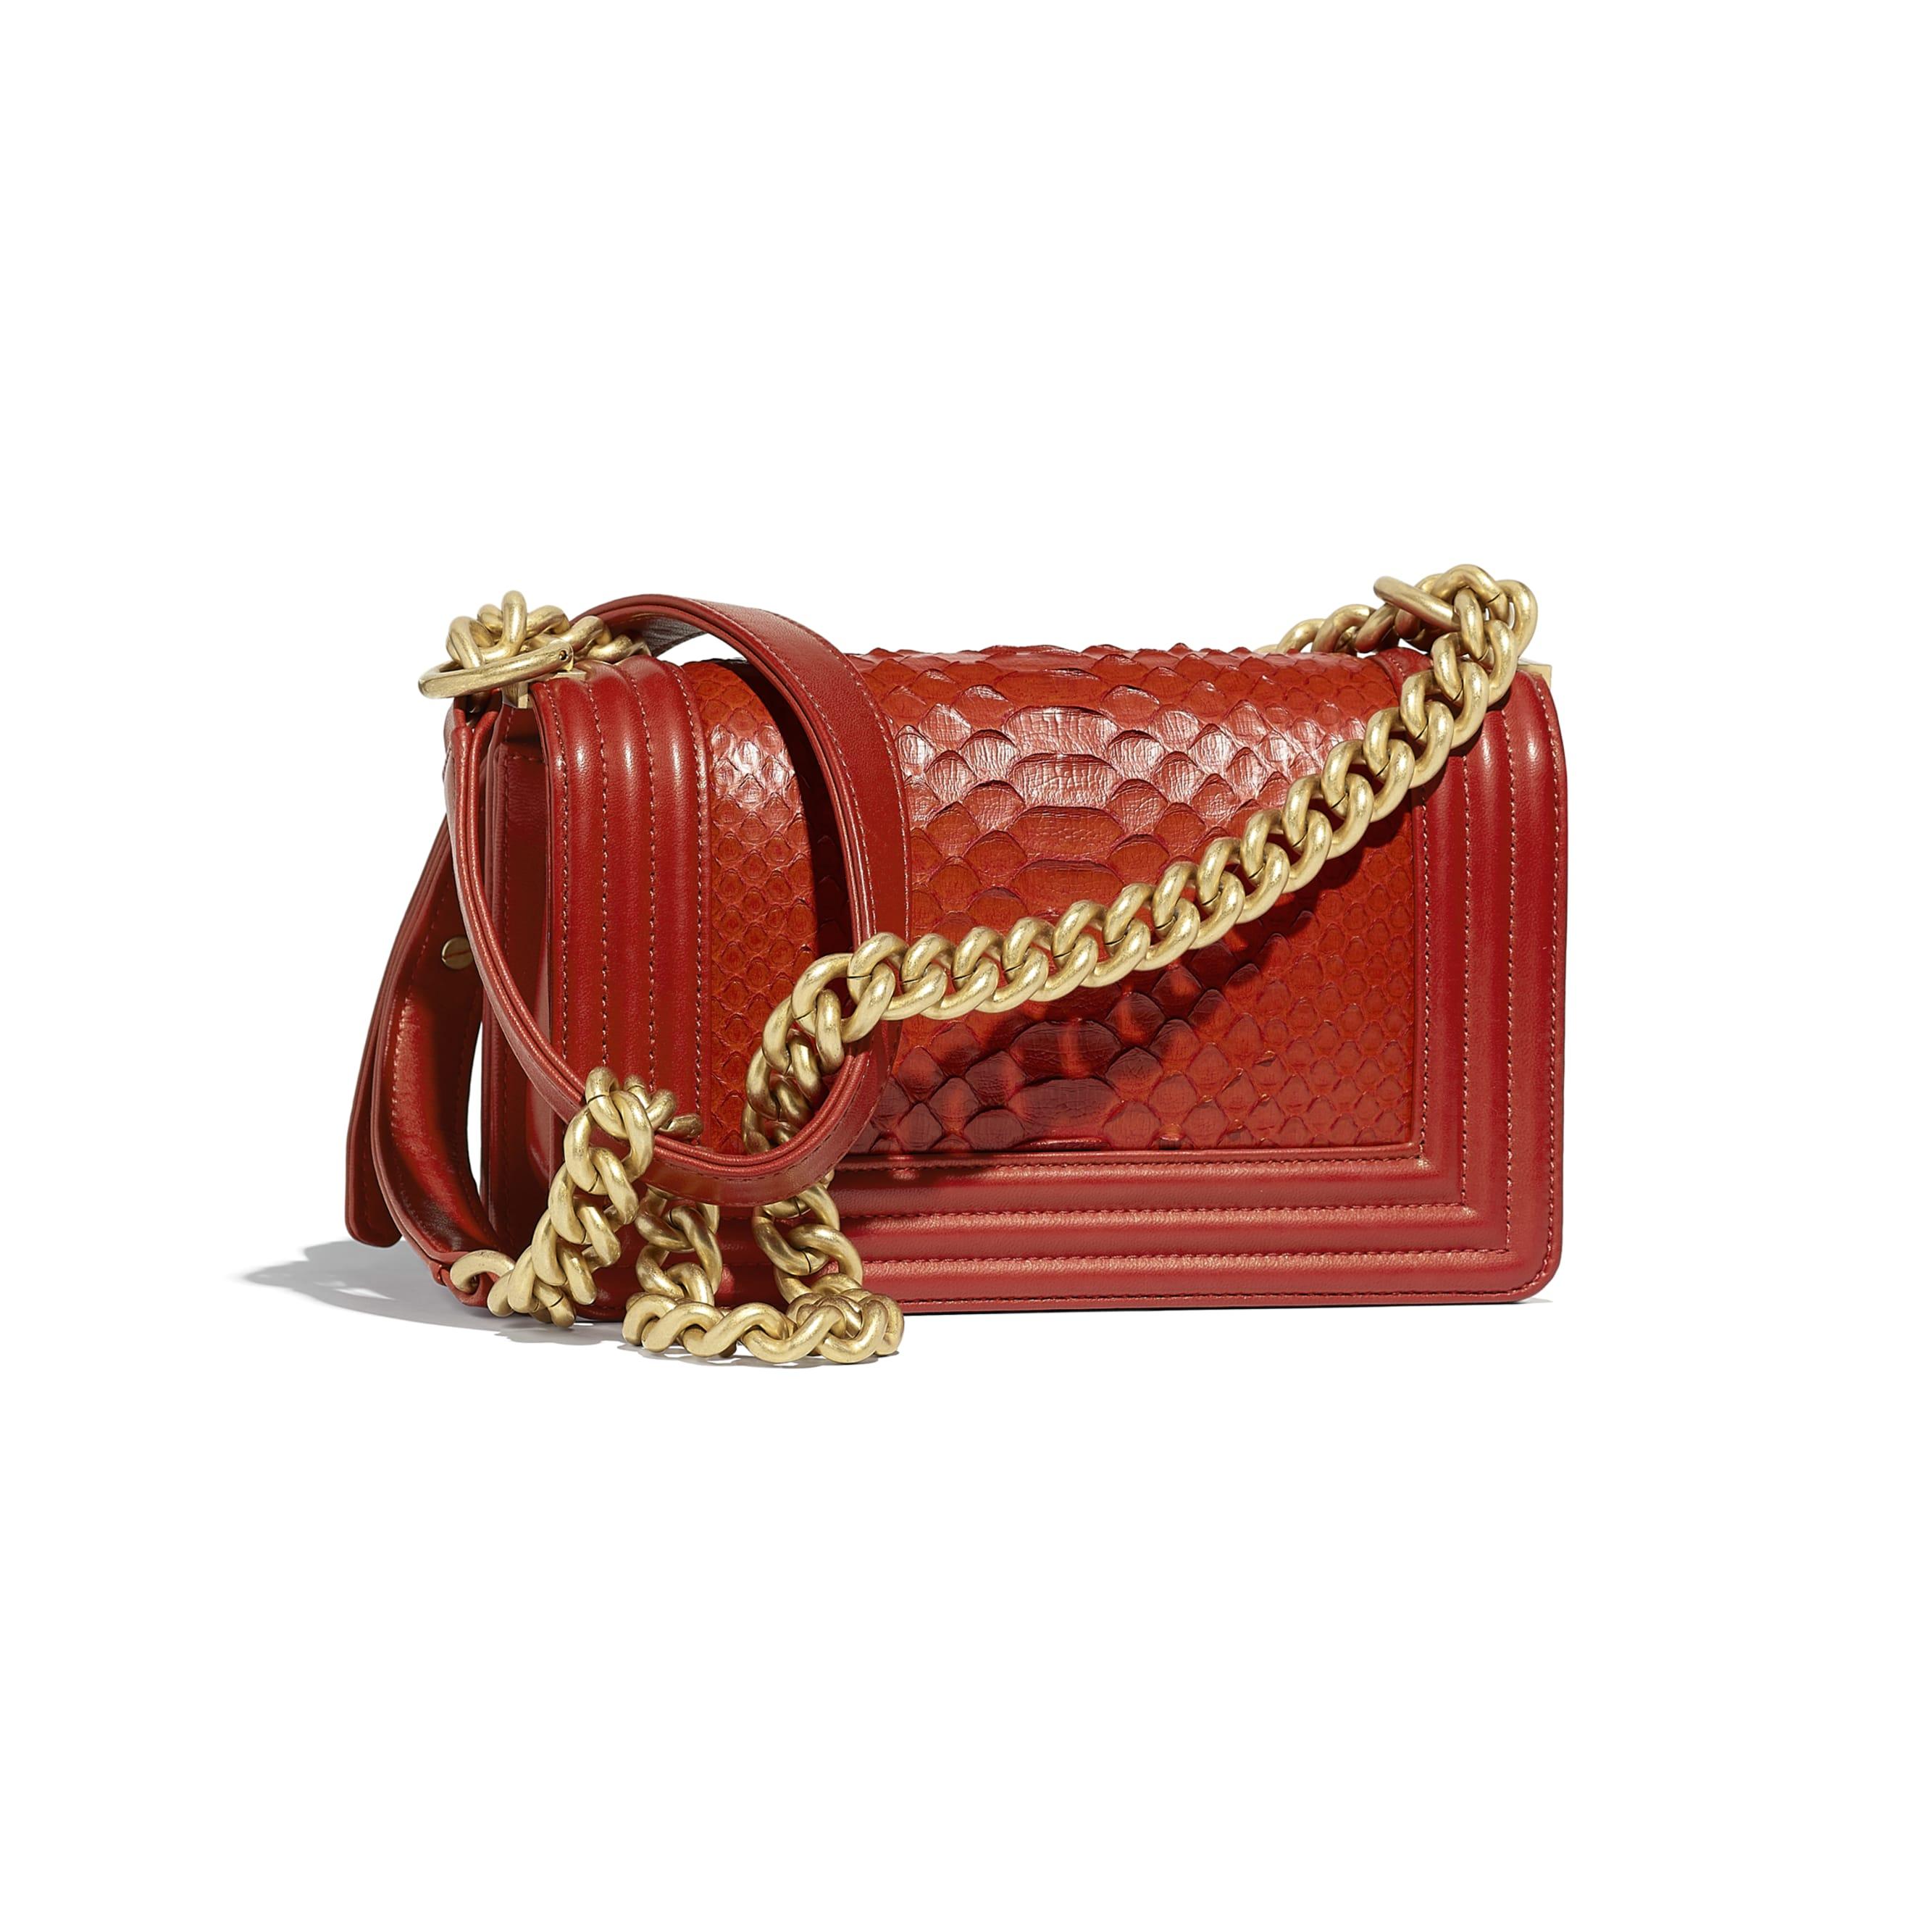 Small BOY CHANEL Handbag - Red - Python, Calfskin & Gold-Tone Metal - Alternative view - see standard sized version